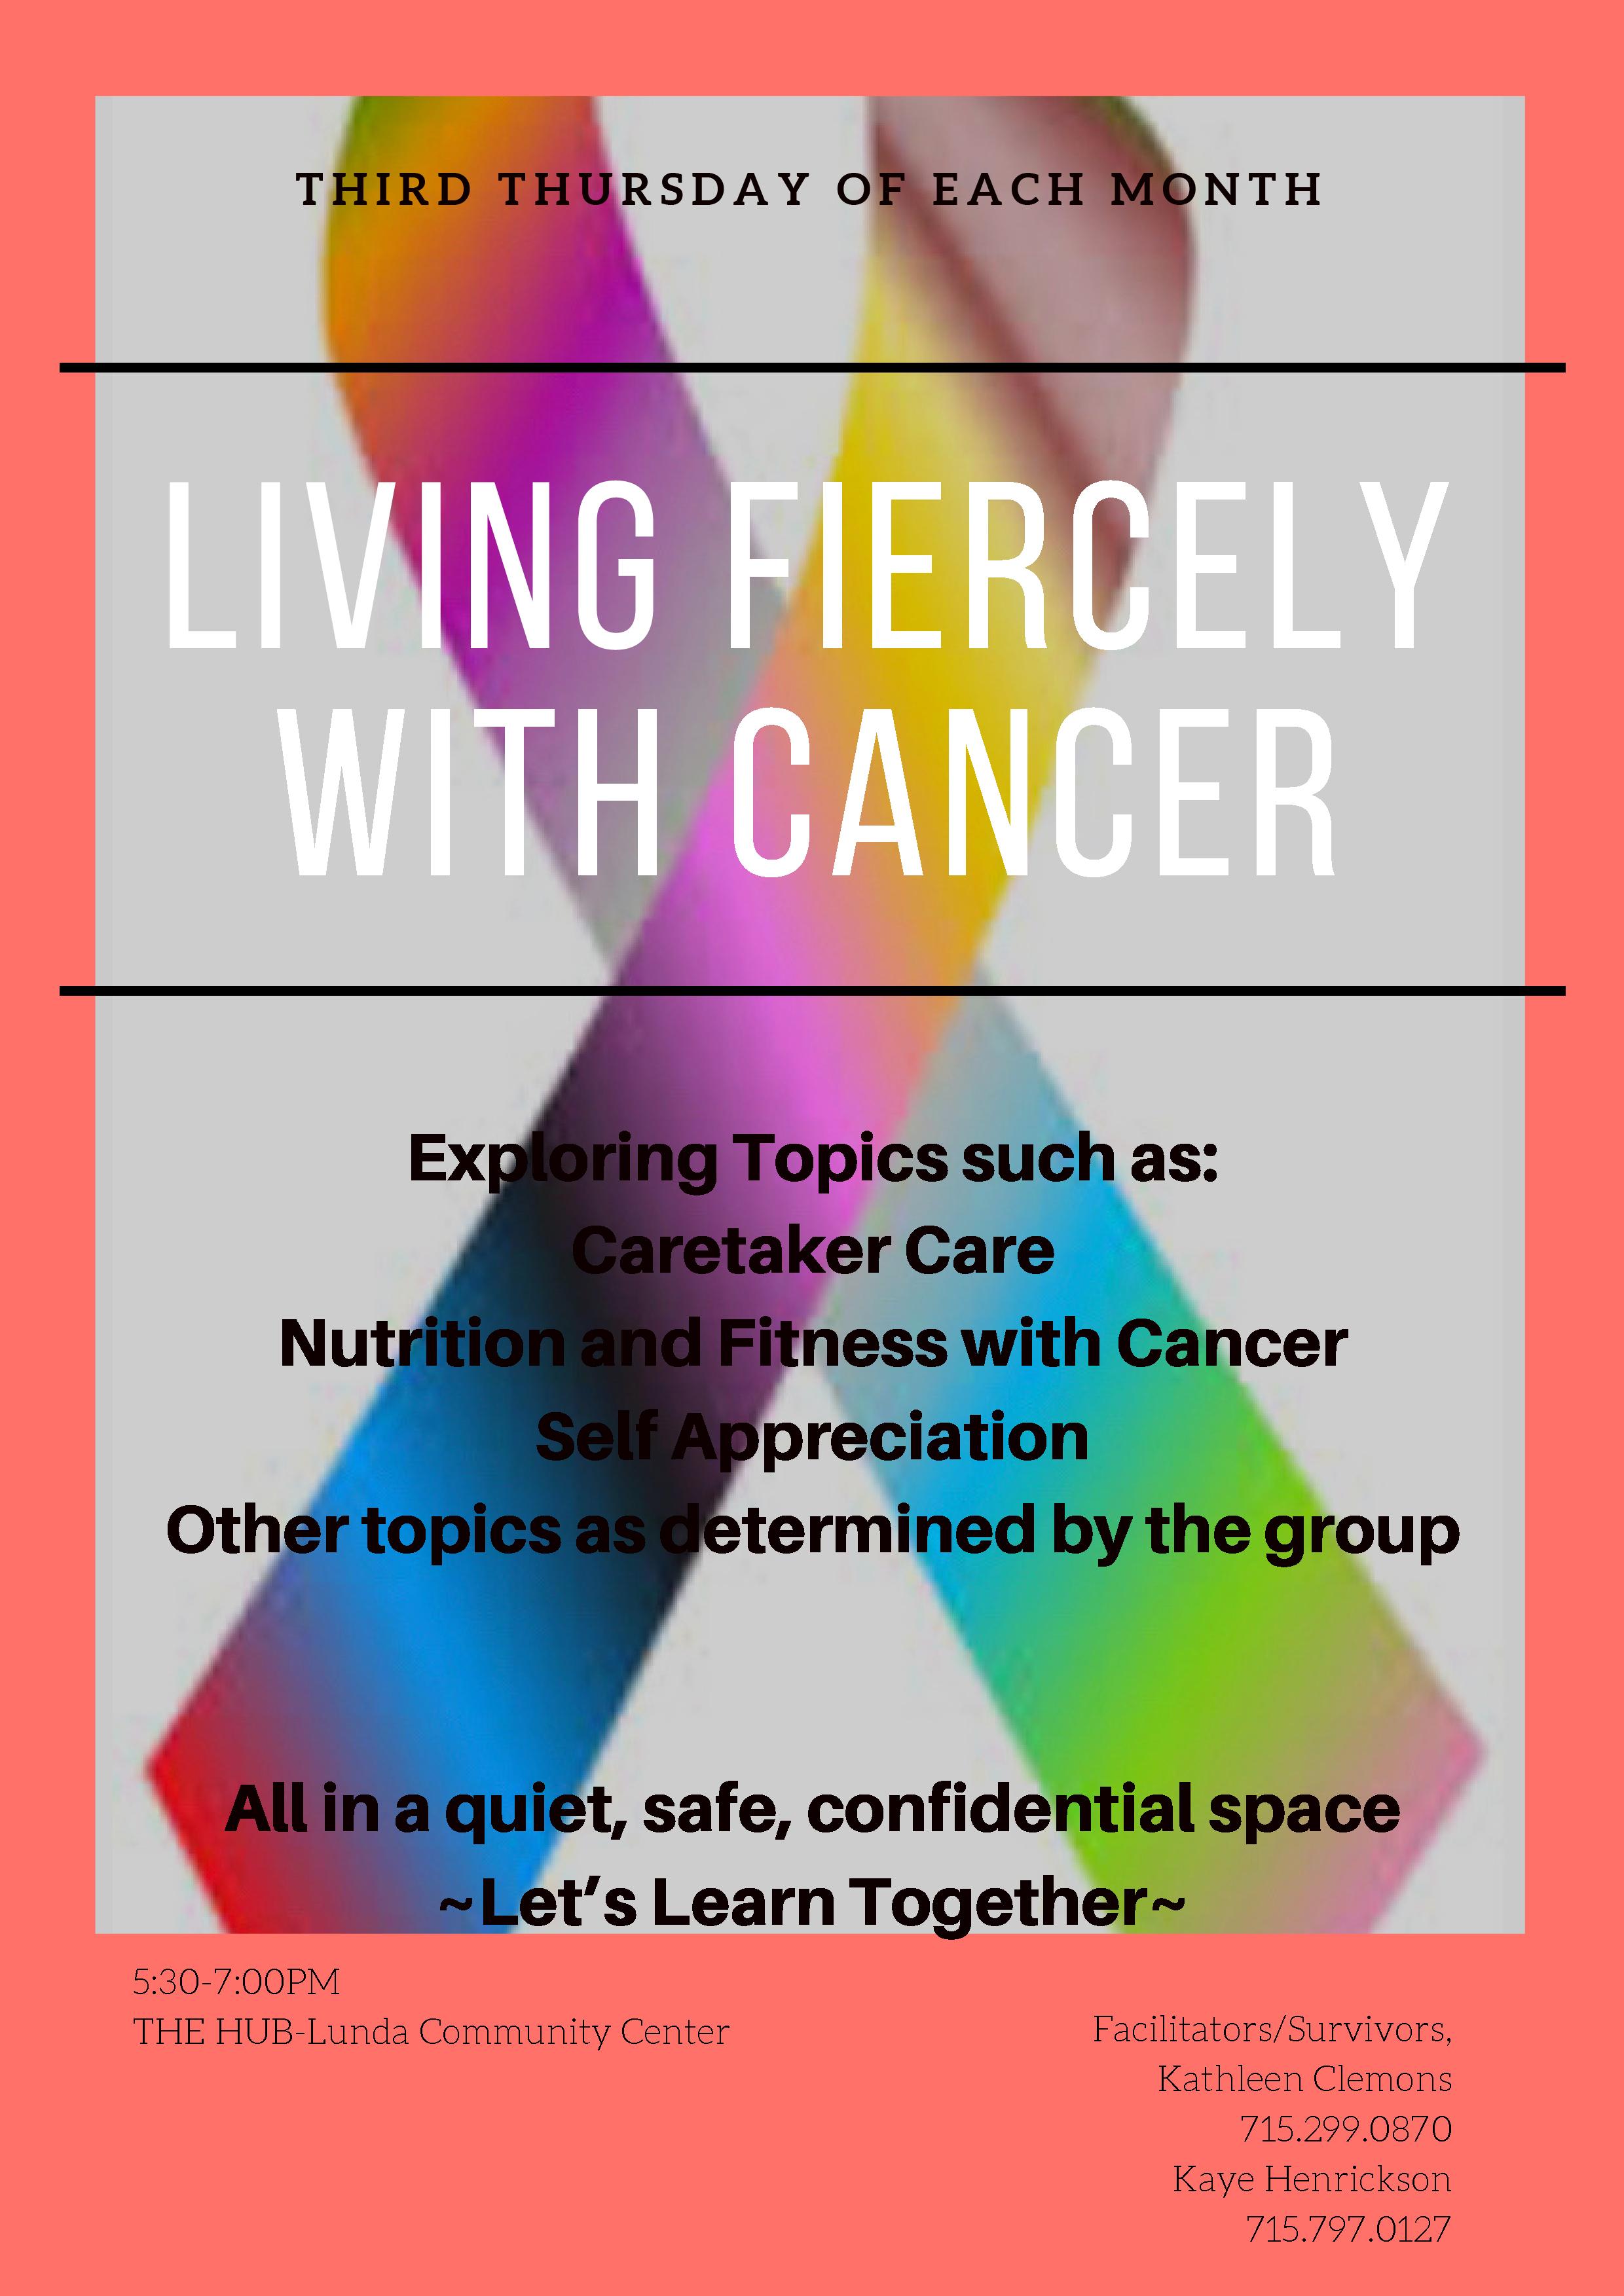 cancersupportgroup.jpg